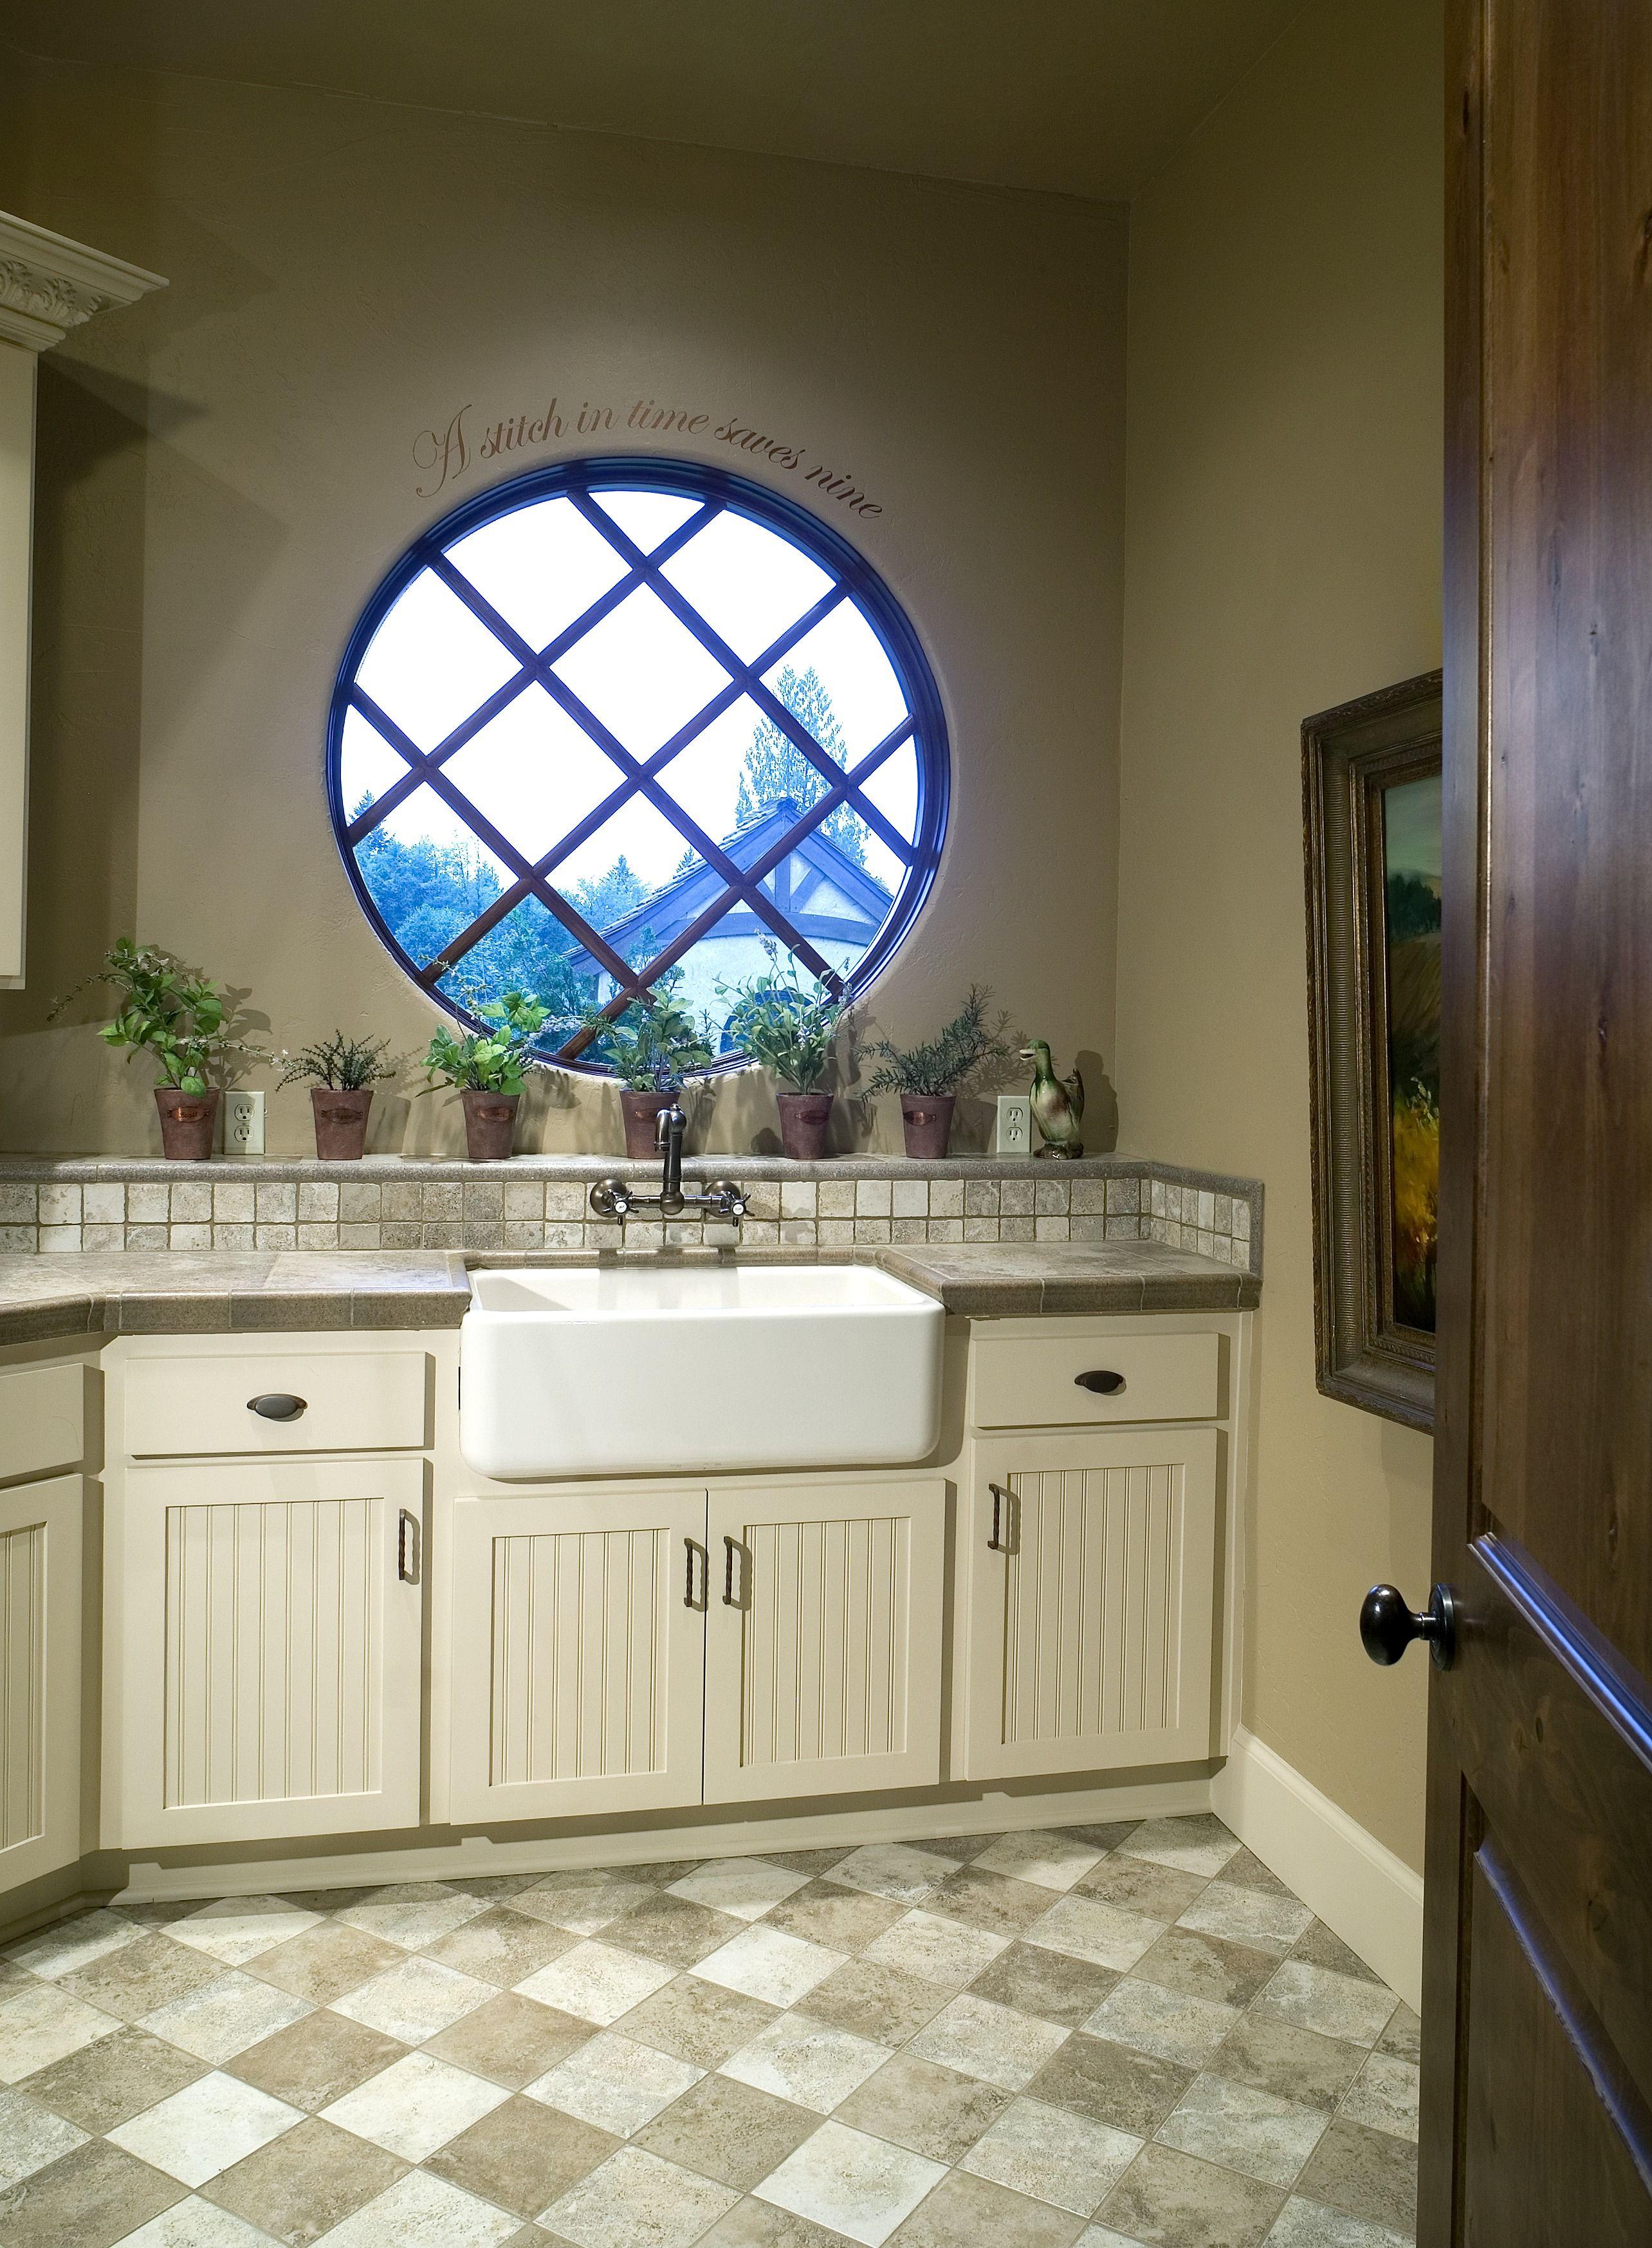 5 ideas for remodeling a bathroom on a budget on bathroom renovation ideas id=30761